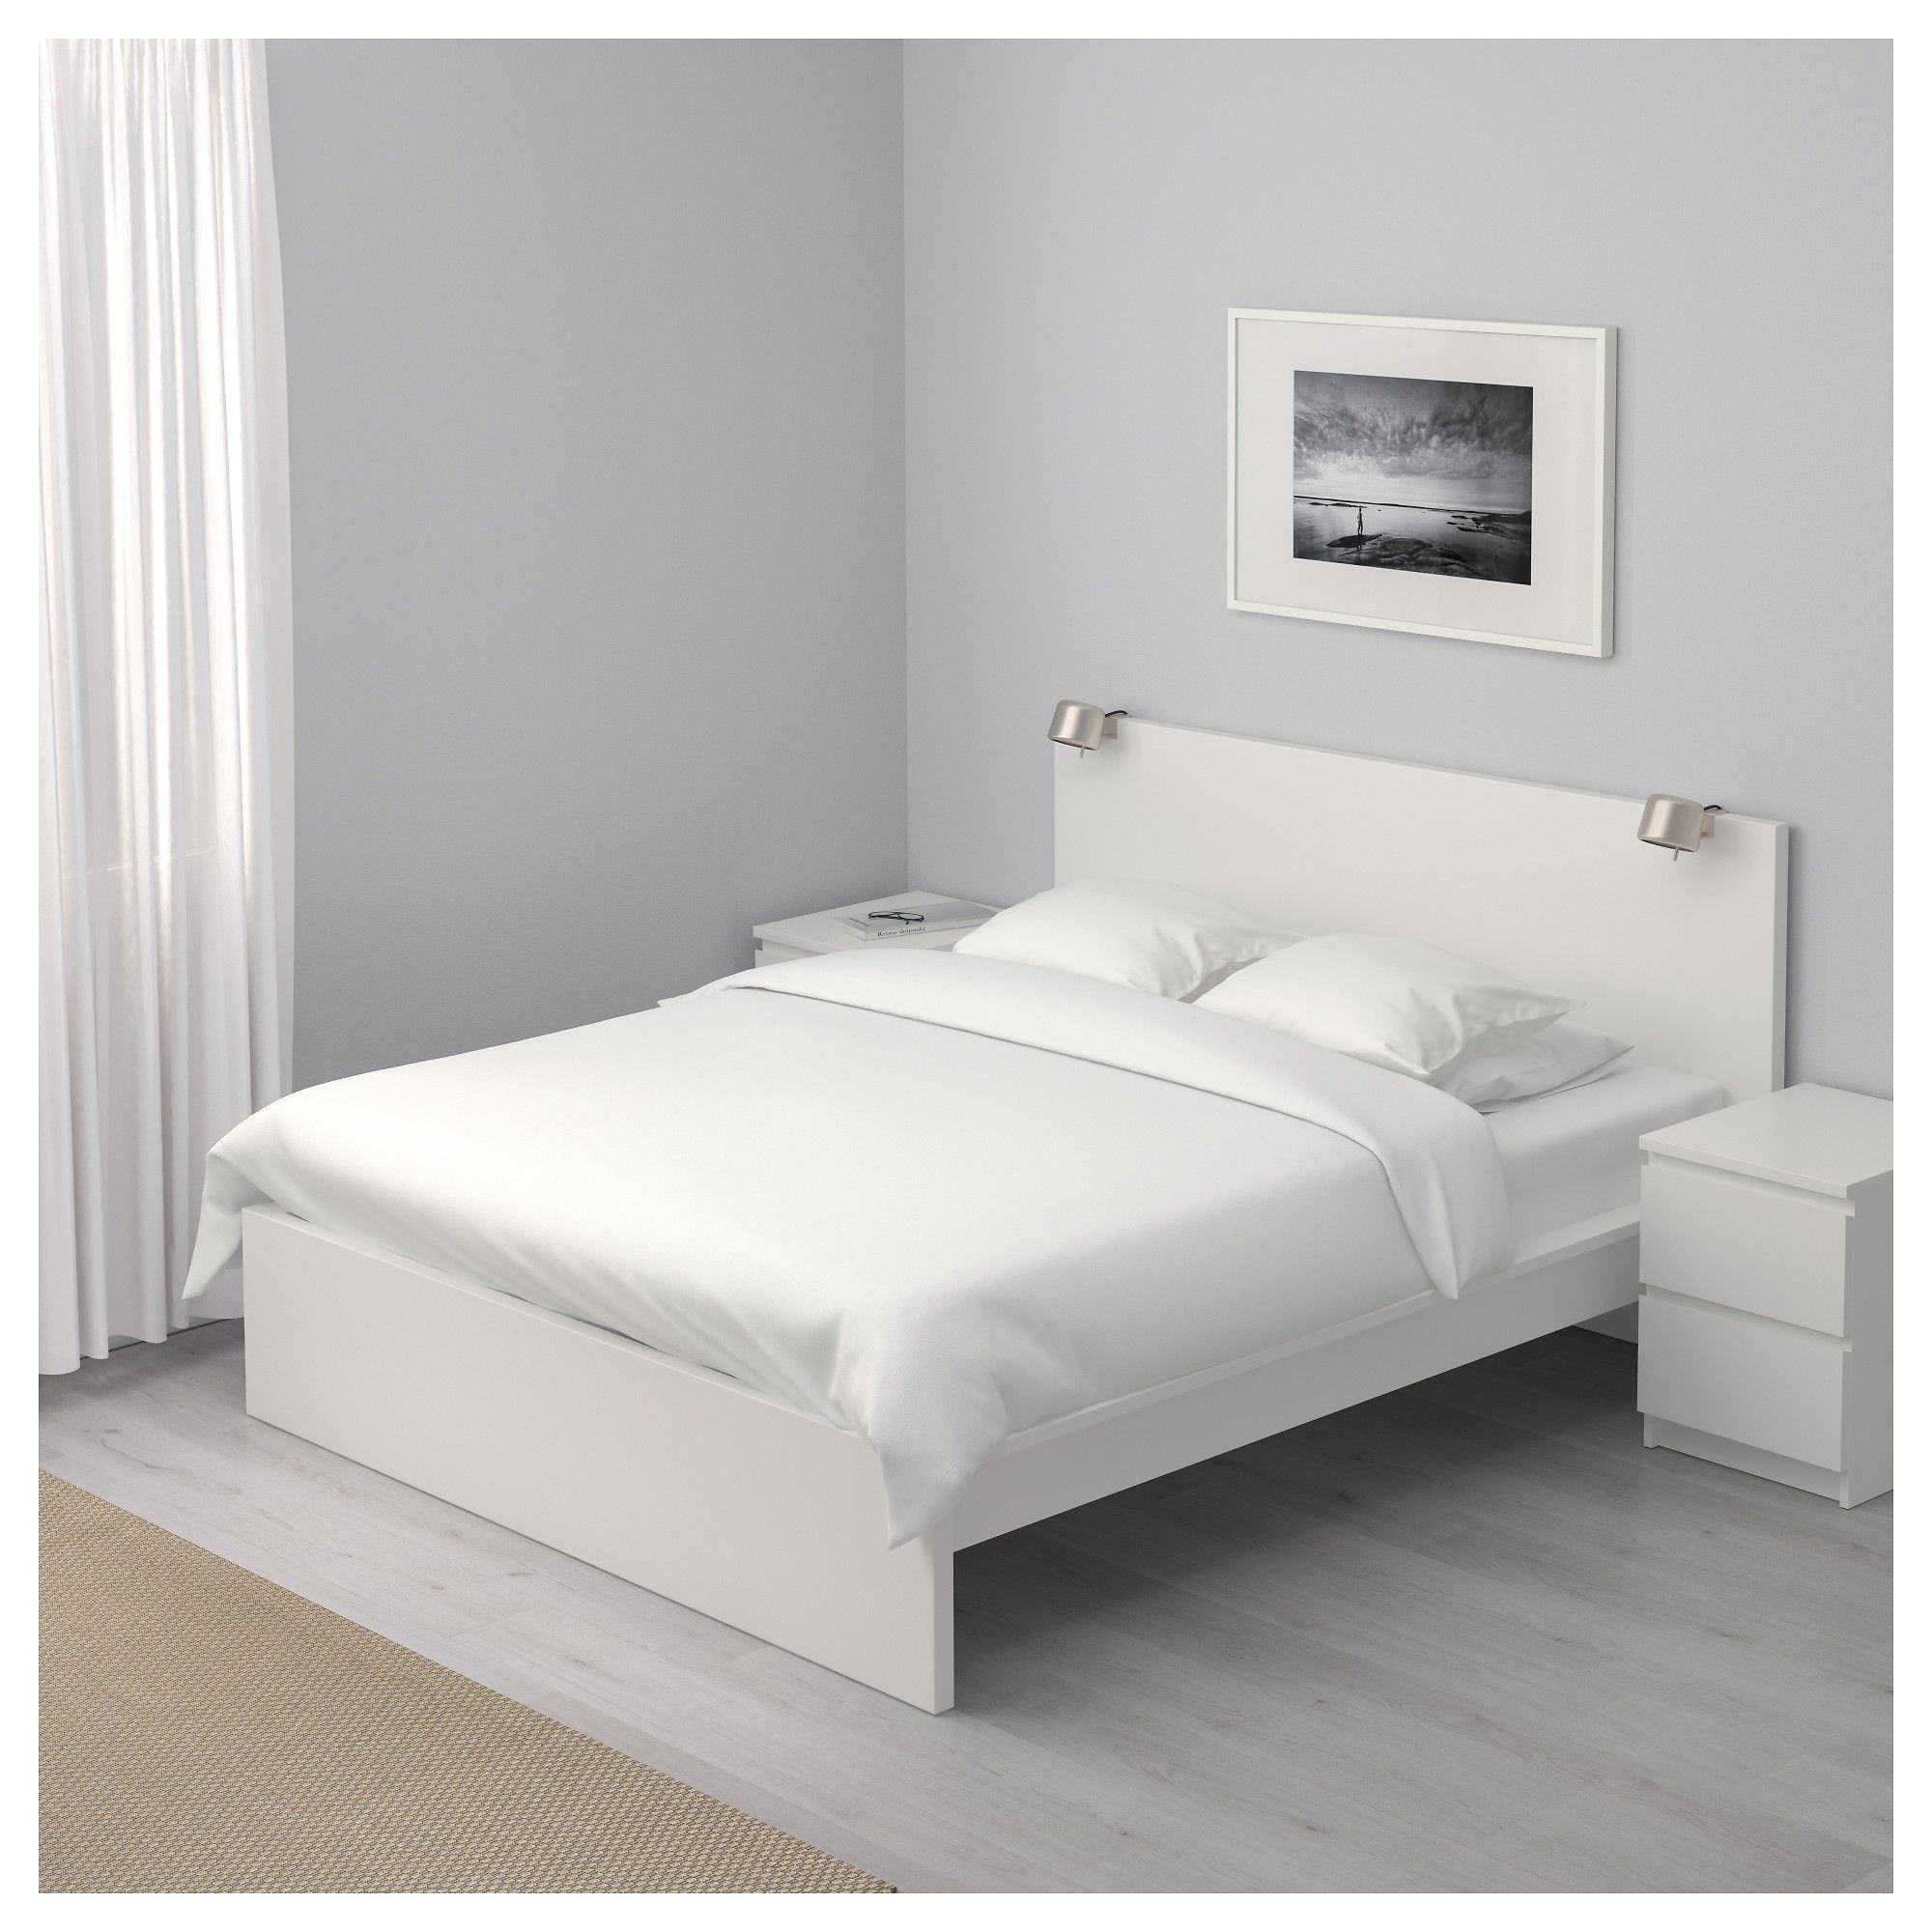 King Bedroom Set Ikea Elegant Ikea Malm White Luröy Bed Frame High